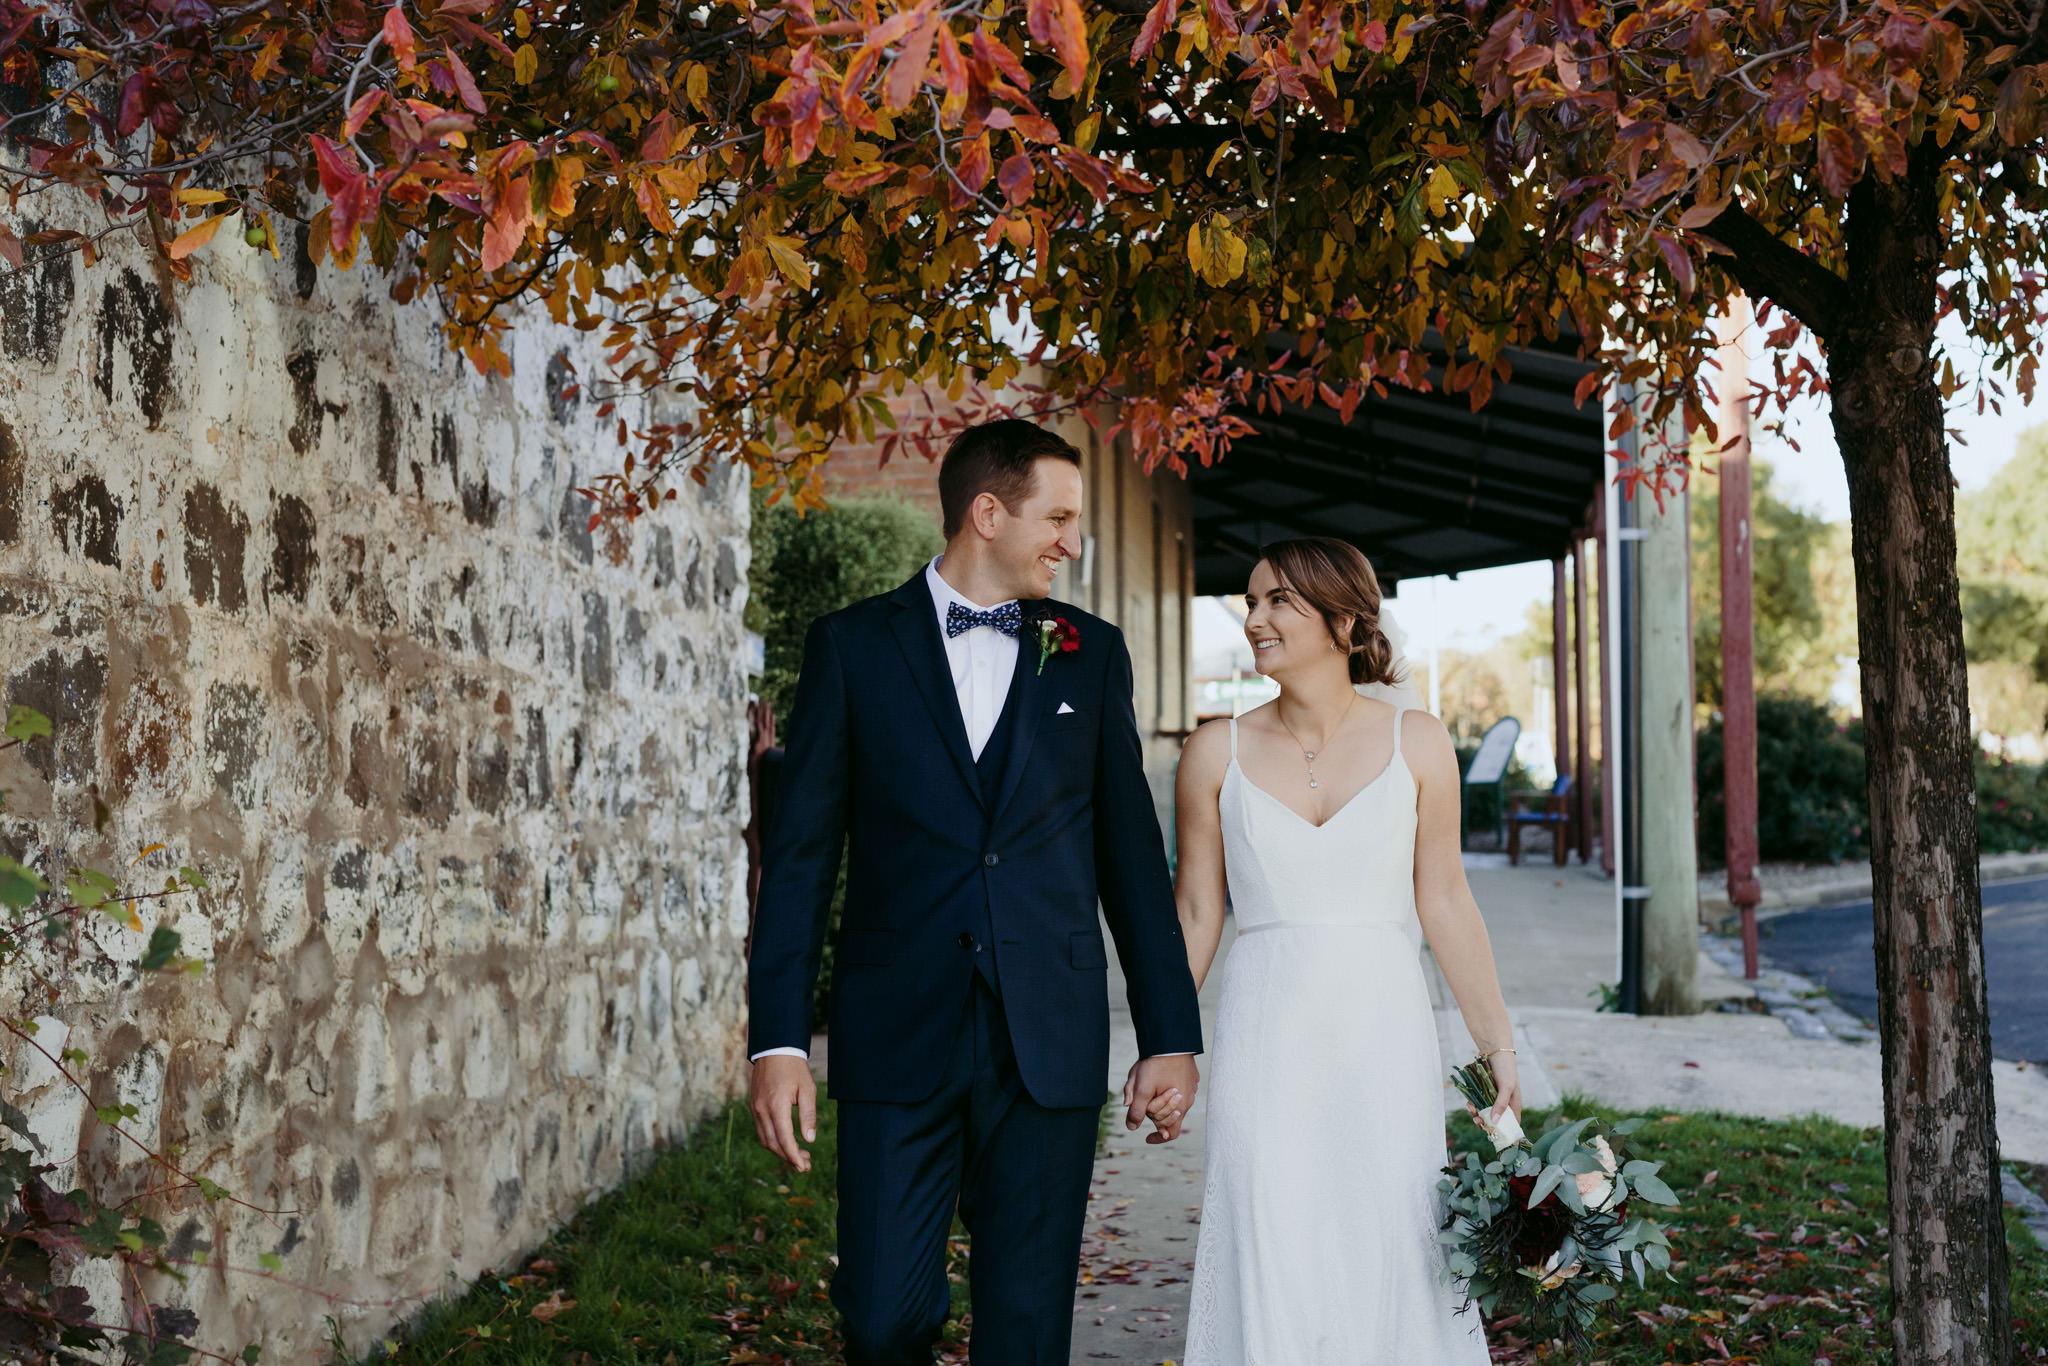 Erin Latimore Mudgee Canberra Wedding Photographer ROSEBANK GUESTHOUSE OLD THEATRE TONIC MILLTHORPE_510.JPG